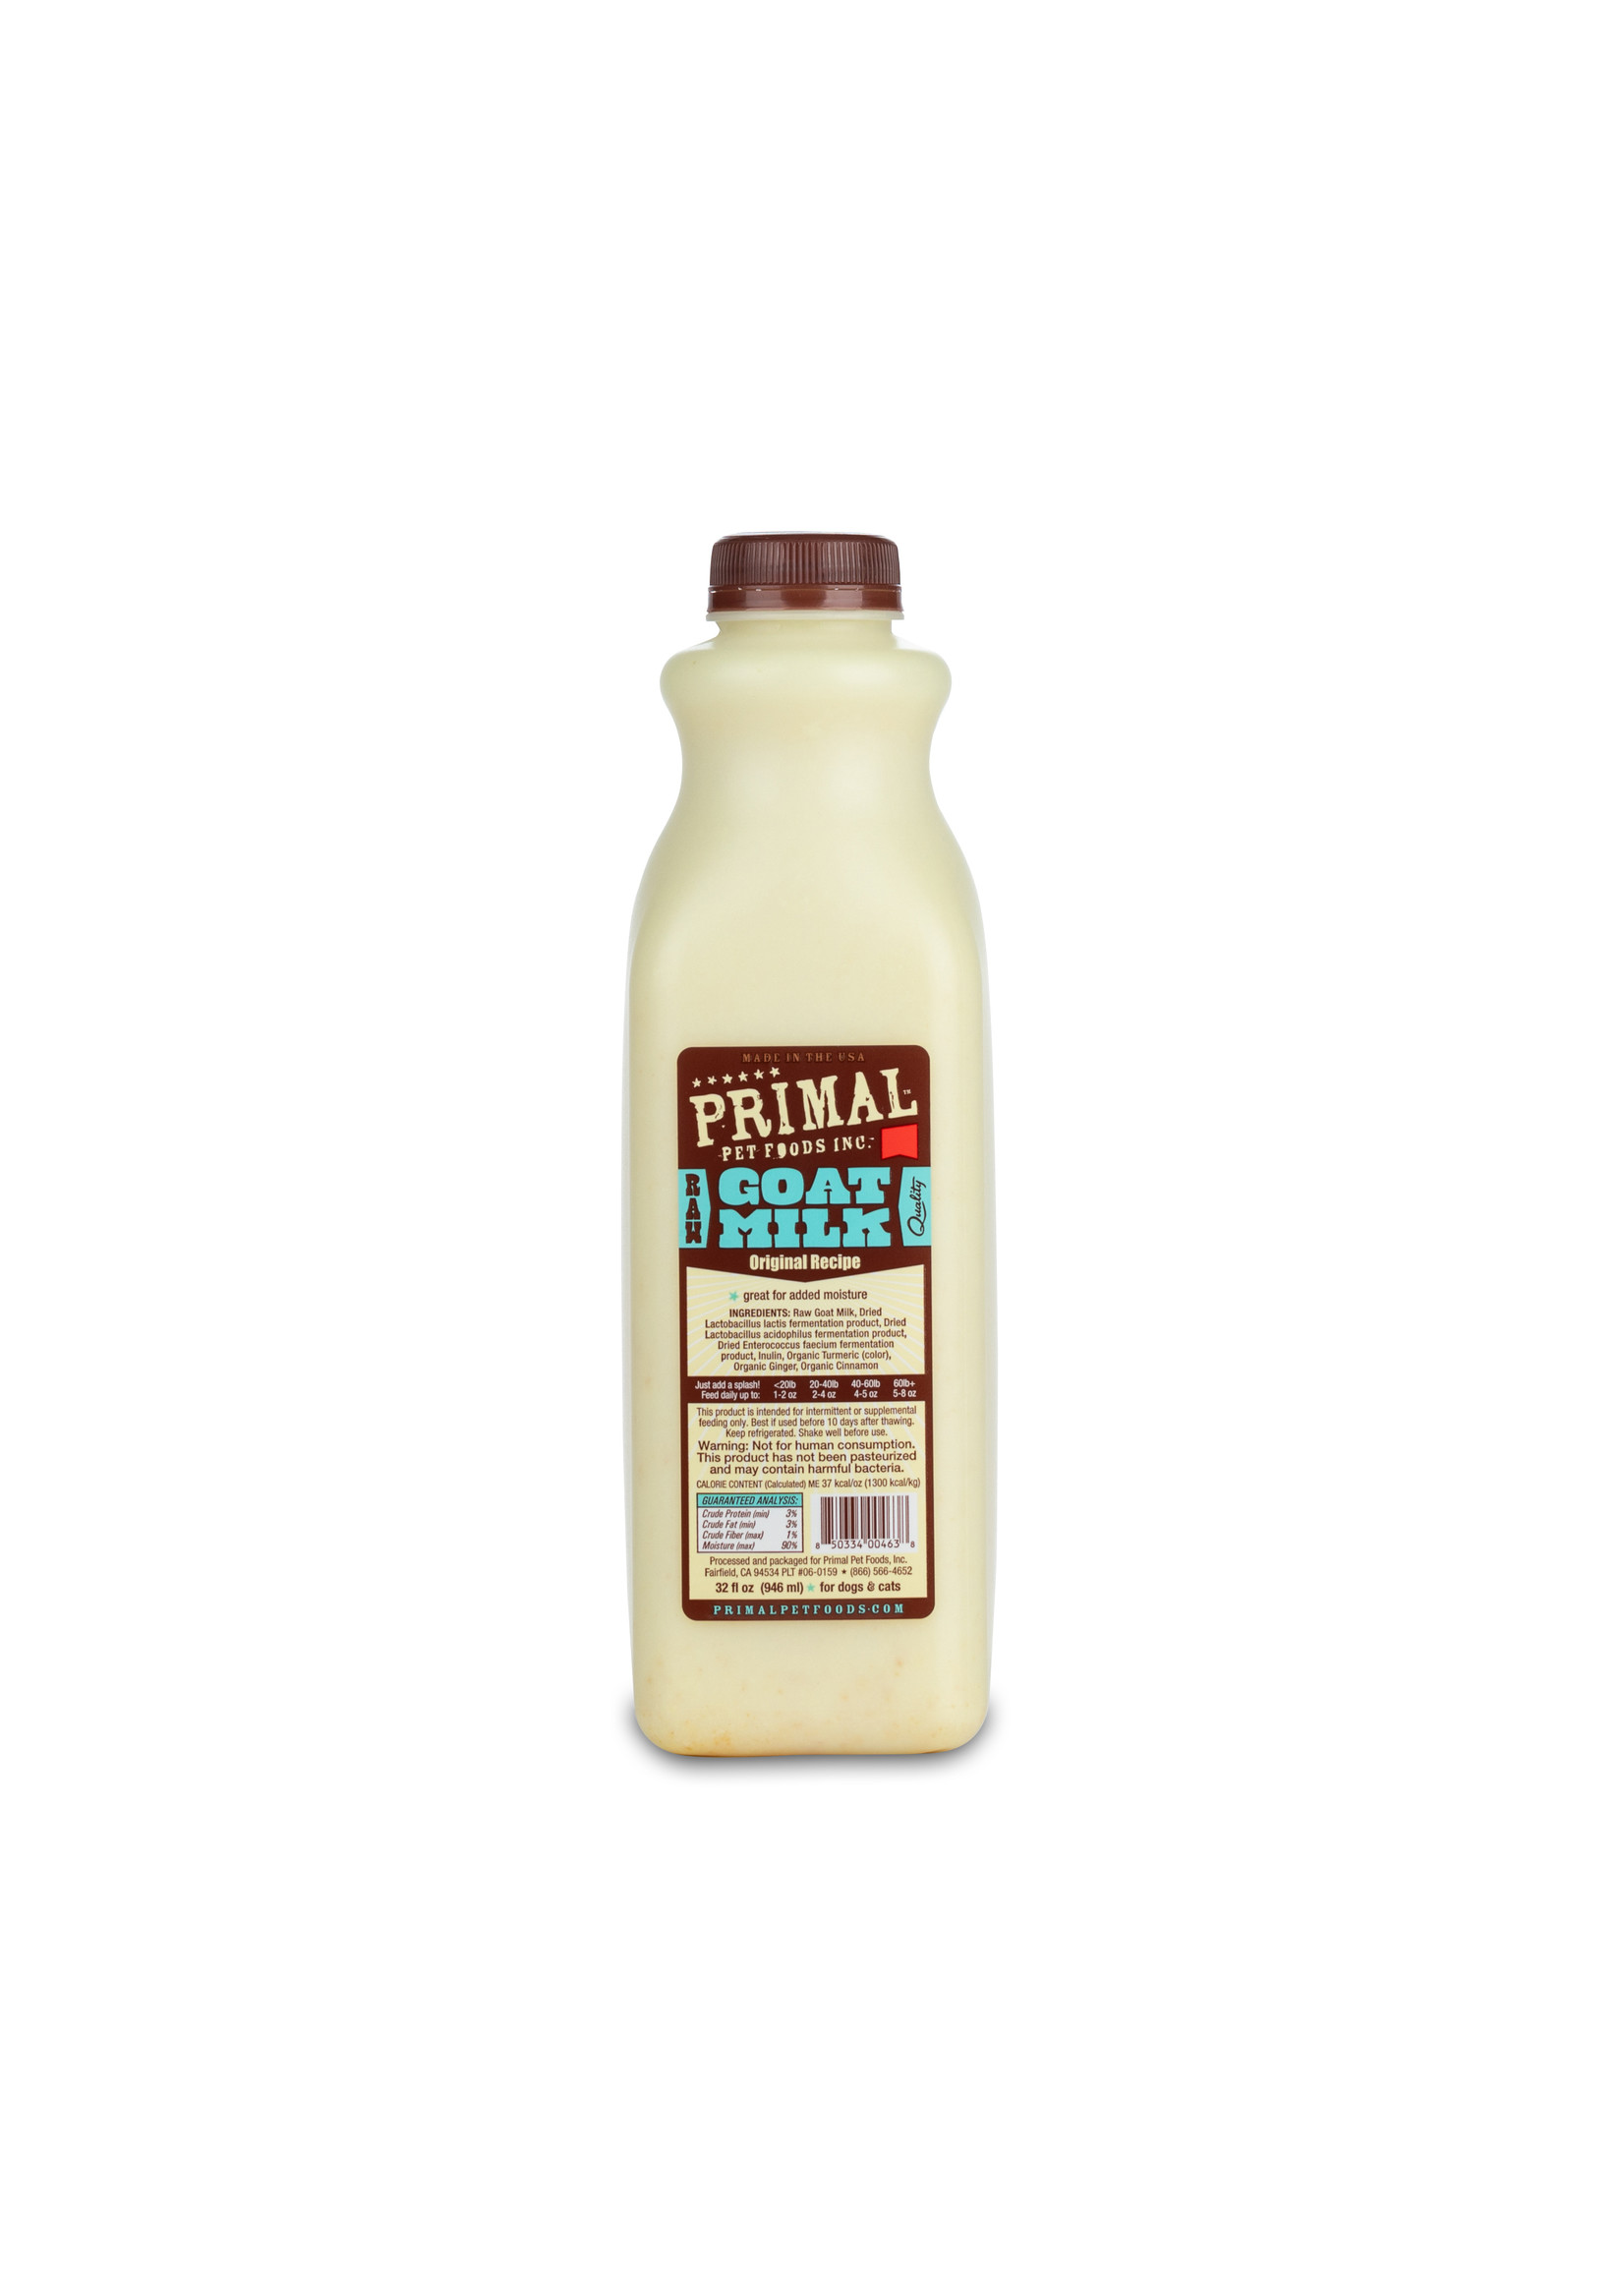 PRIMAL PET FOODS Primal Goat Milk